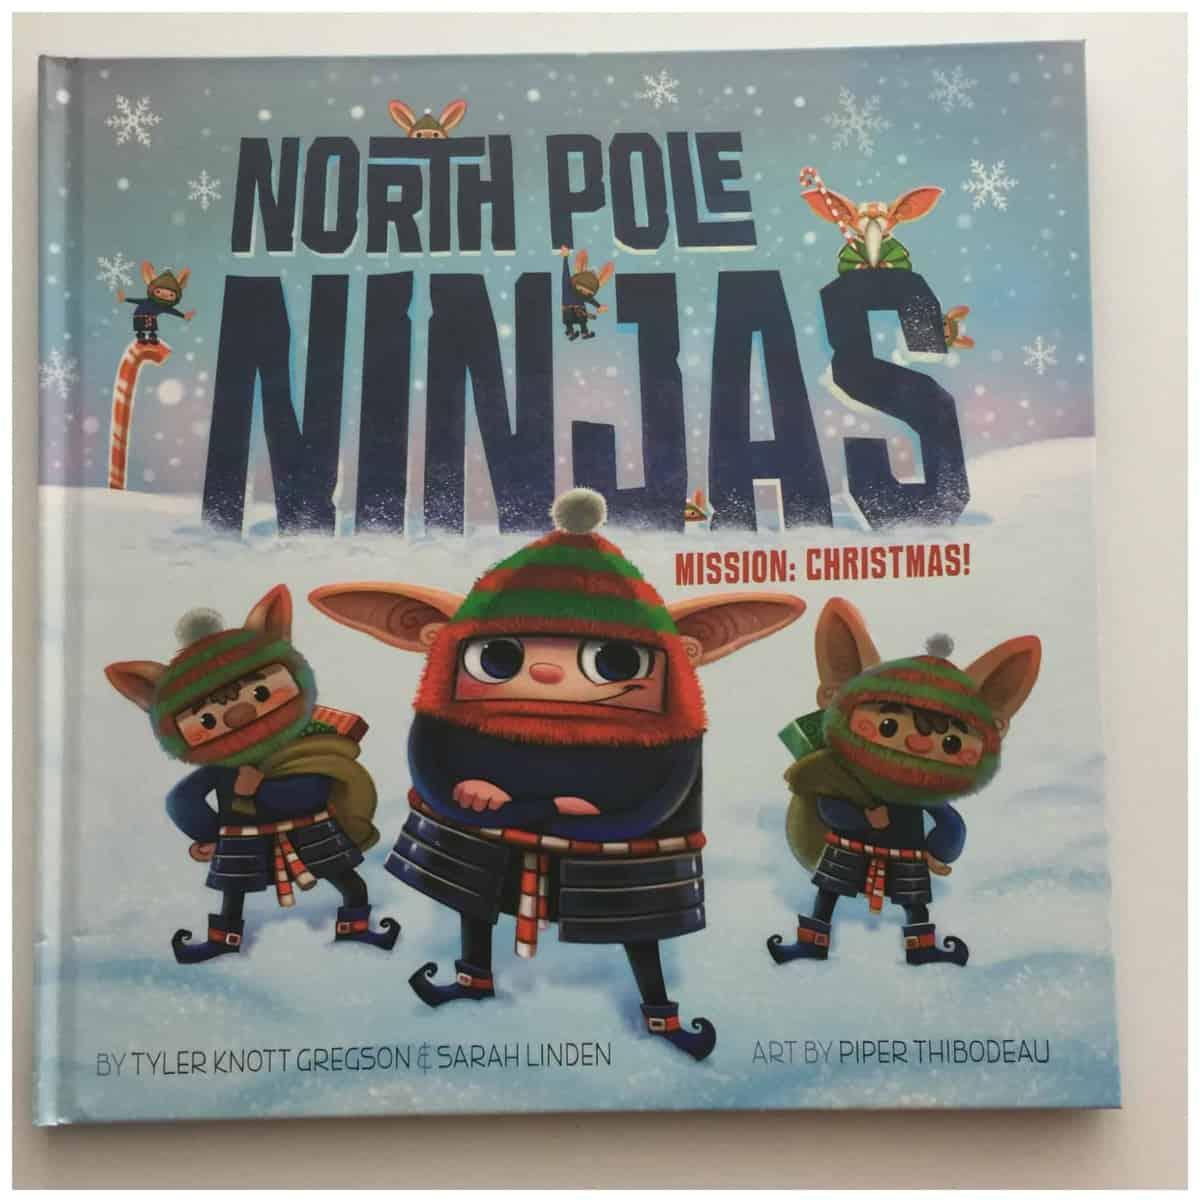 North Pole Ninjas Mission: Christmas! - A Sparkle of Genius